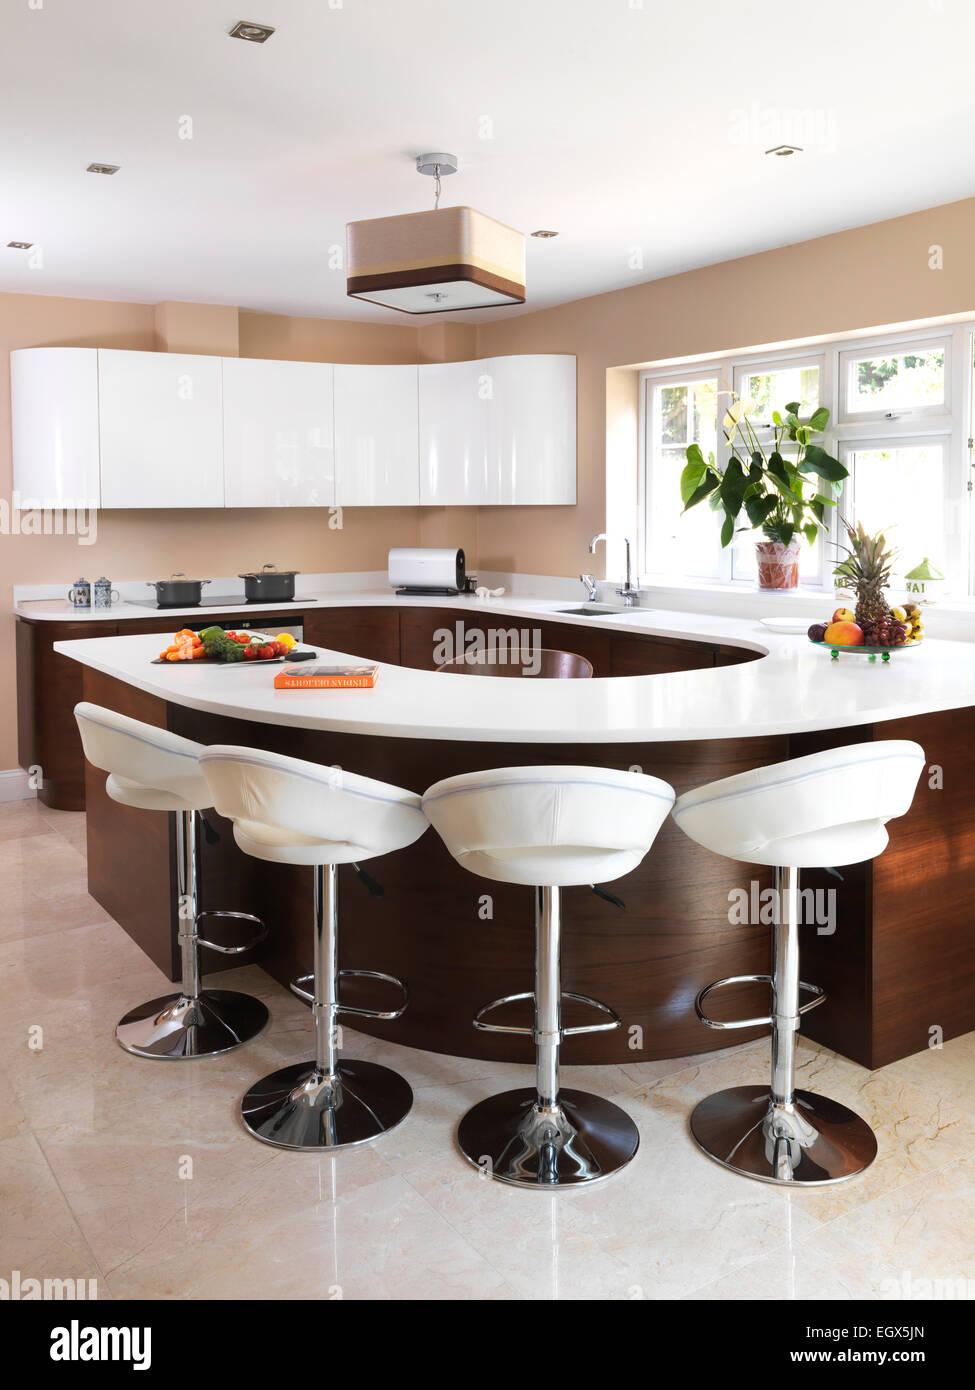 Bar Stools At Breakfast Bar In Modern Kitchen Uk Home Stock Photo Alamy